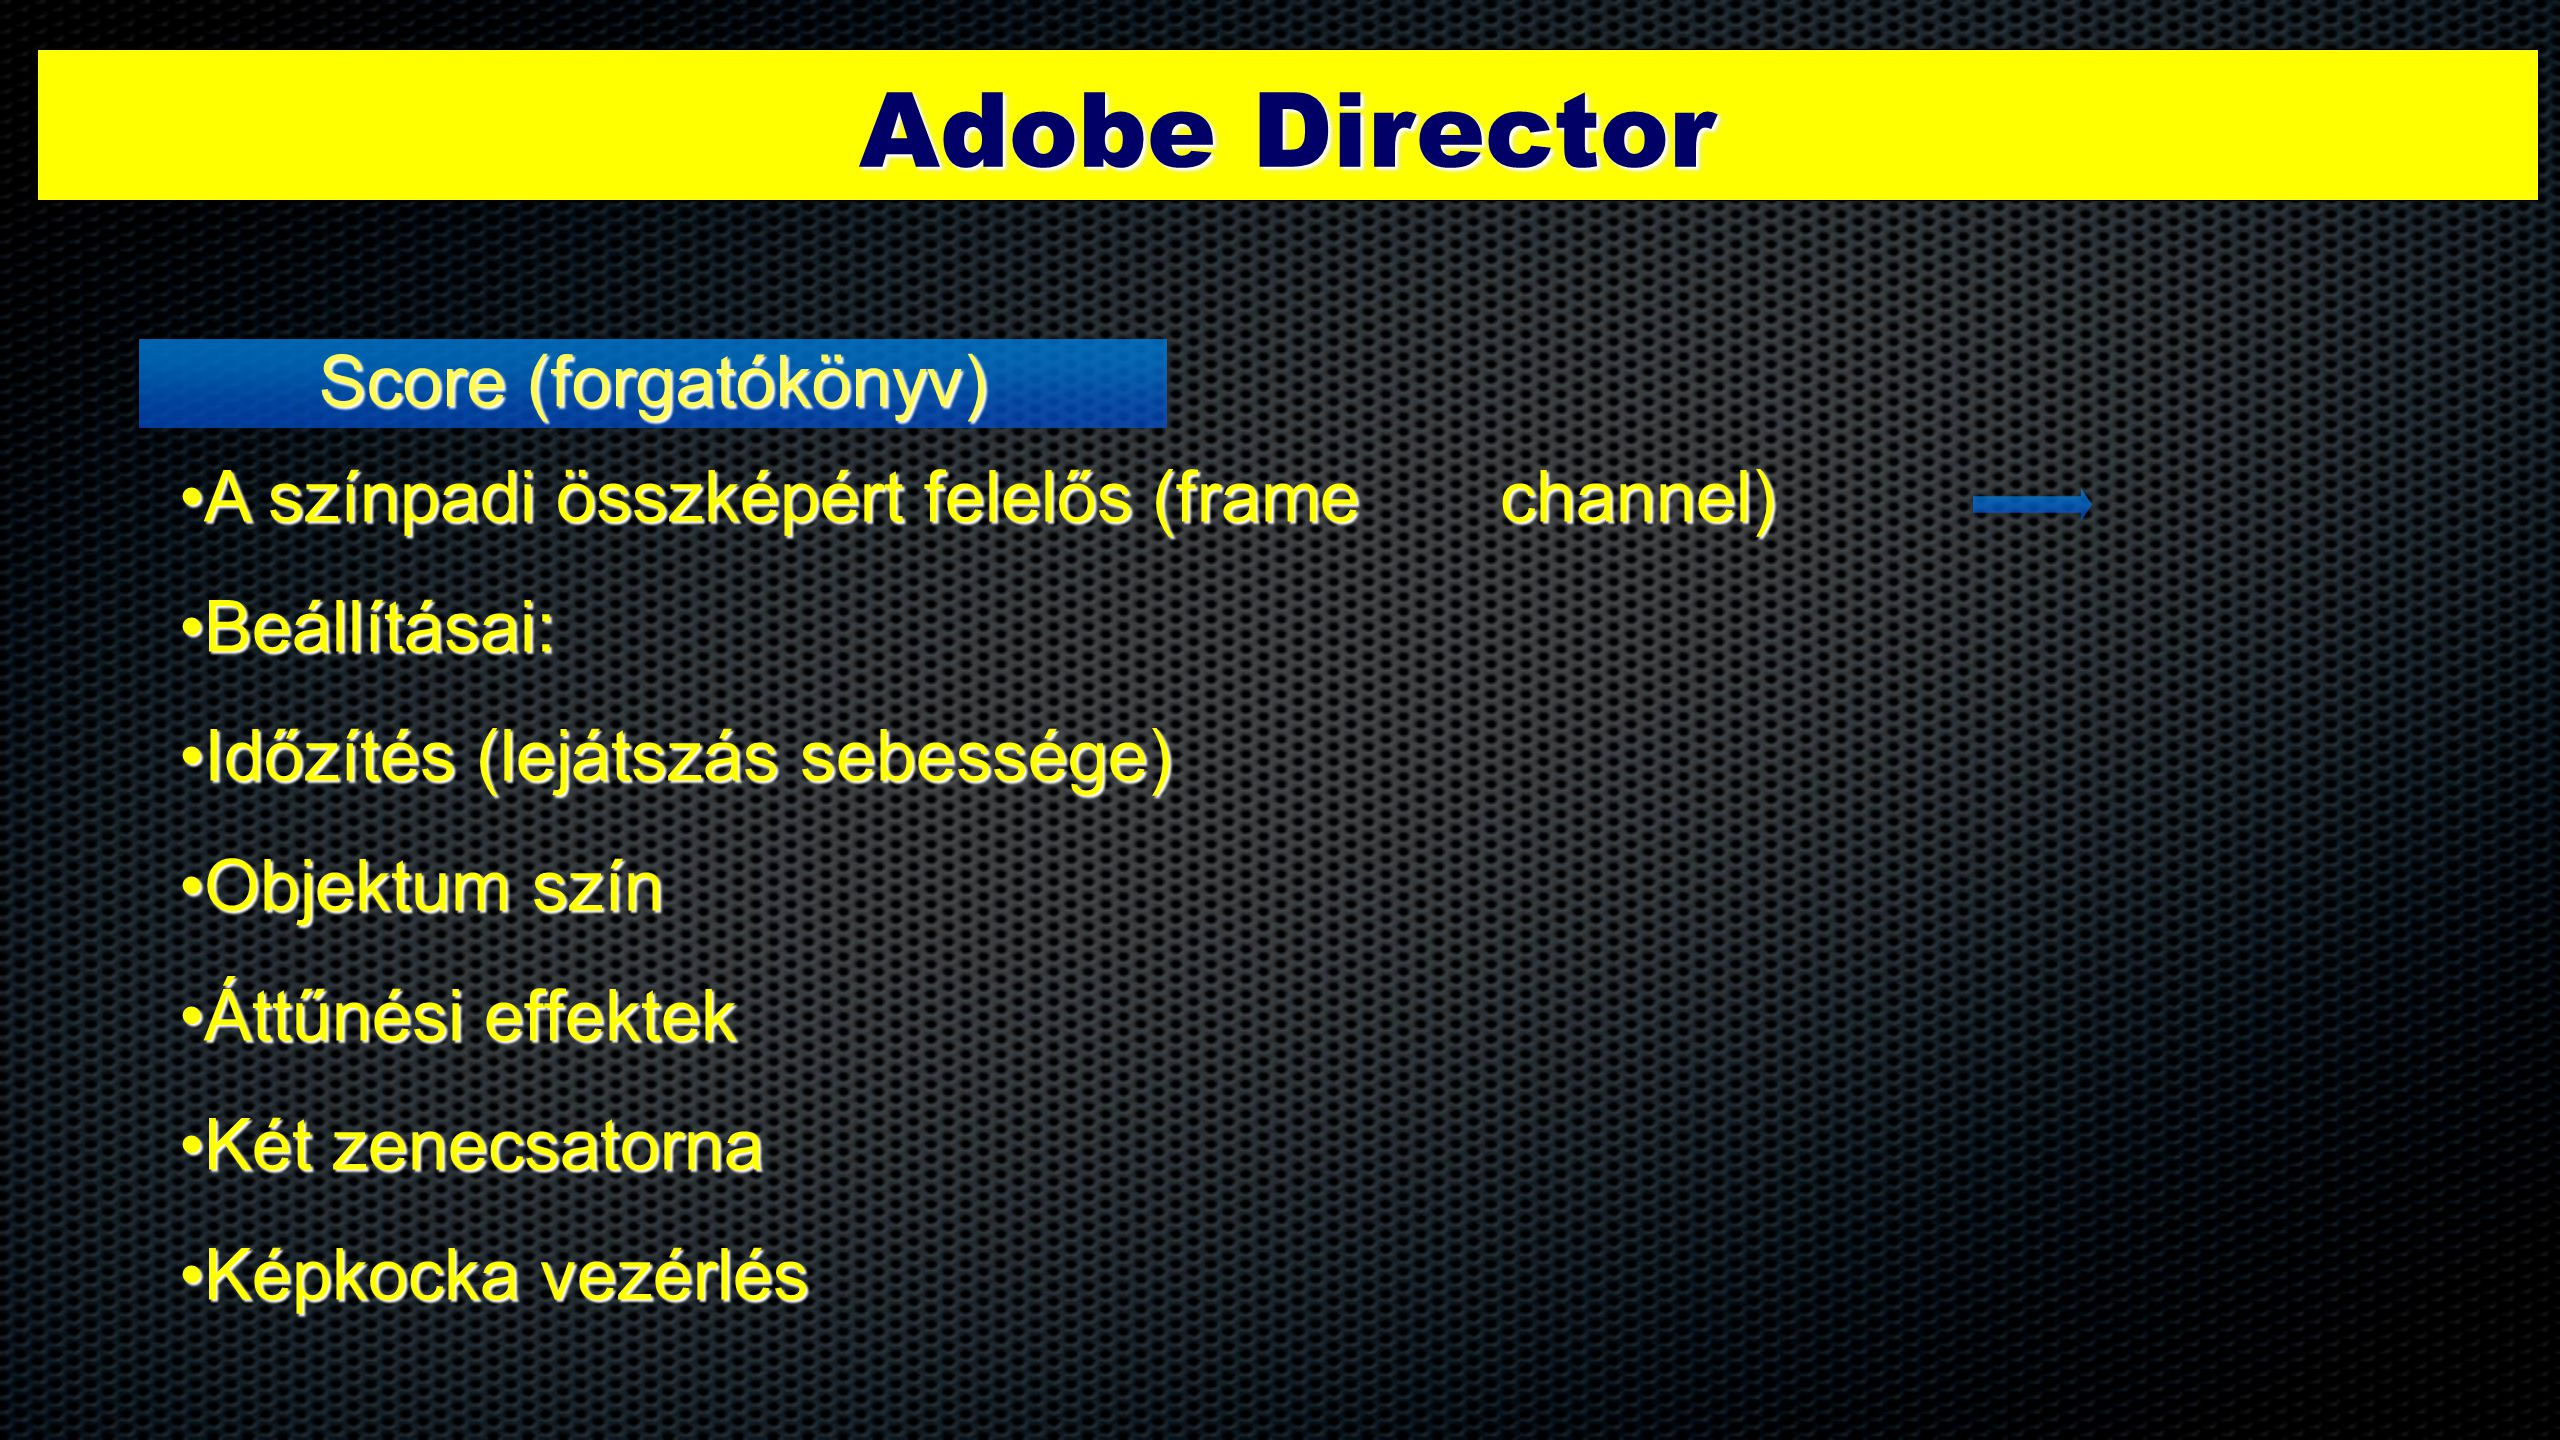 Adobe Director Score (forgatókönyv)